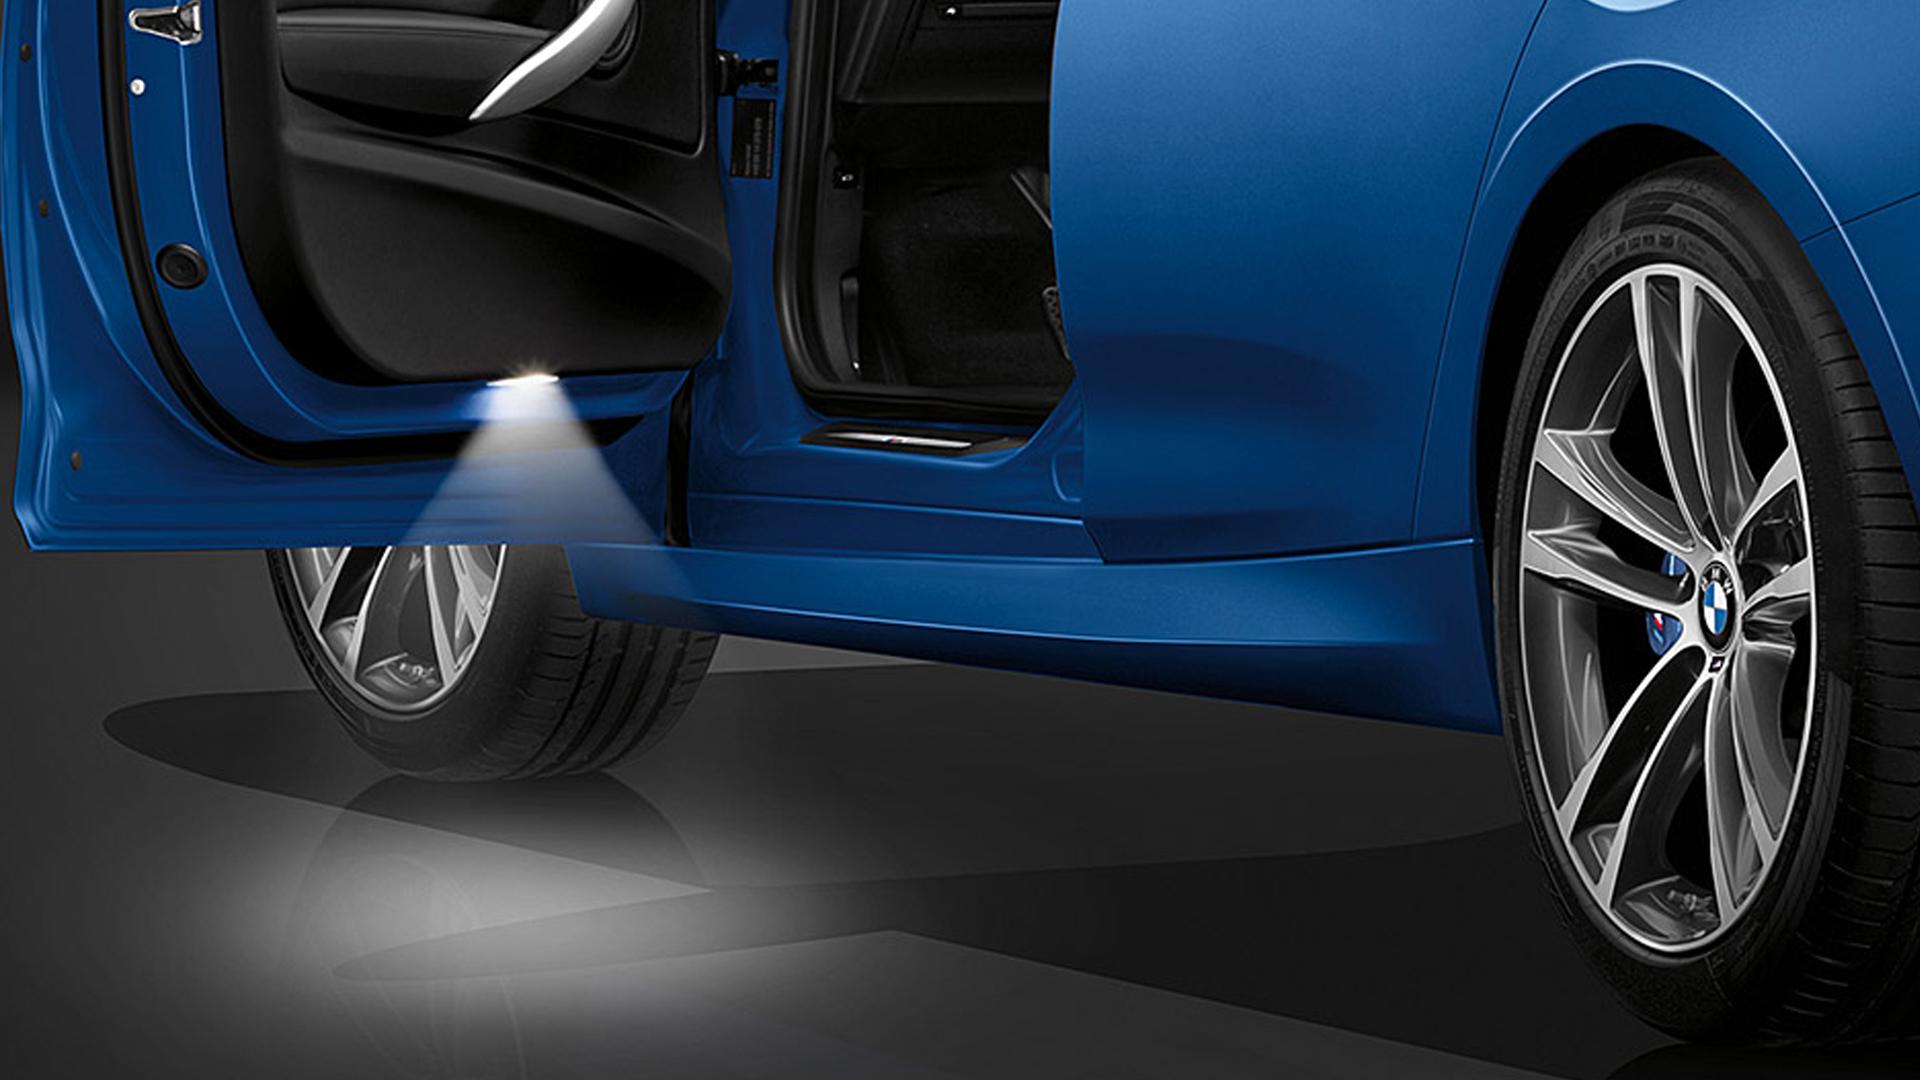 BMW 3 series 2016 330i GT Luxury Line Exterior